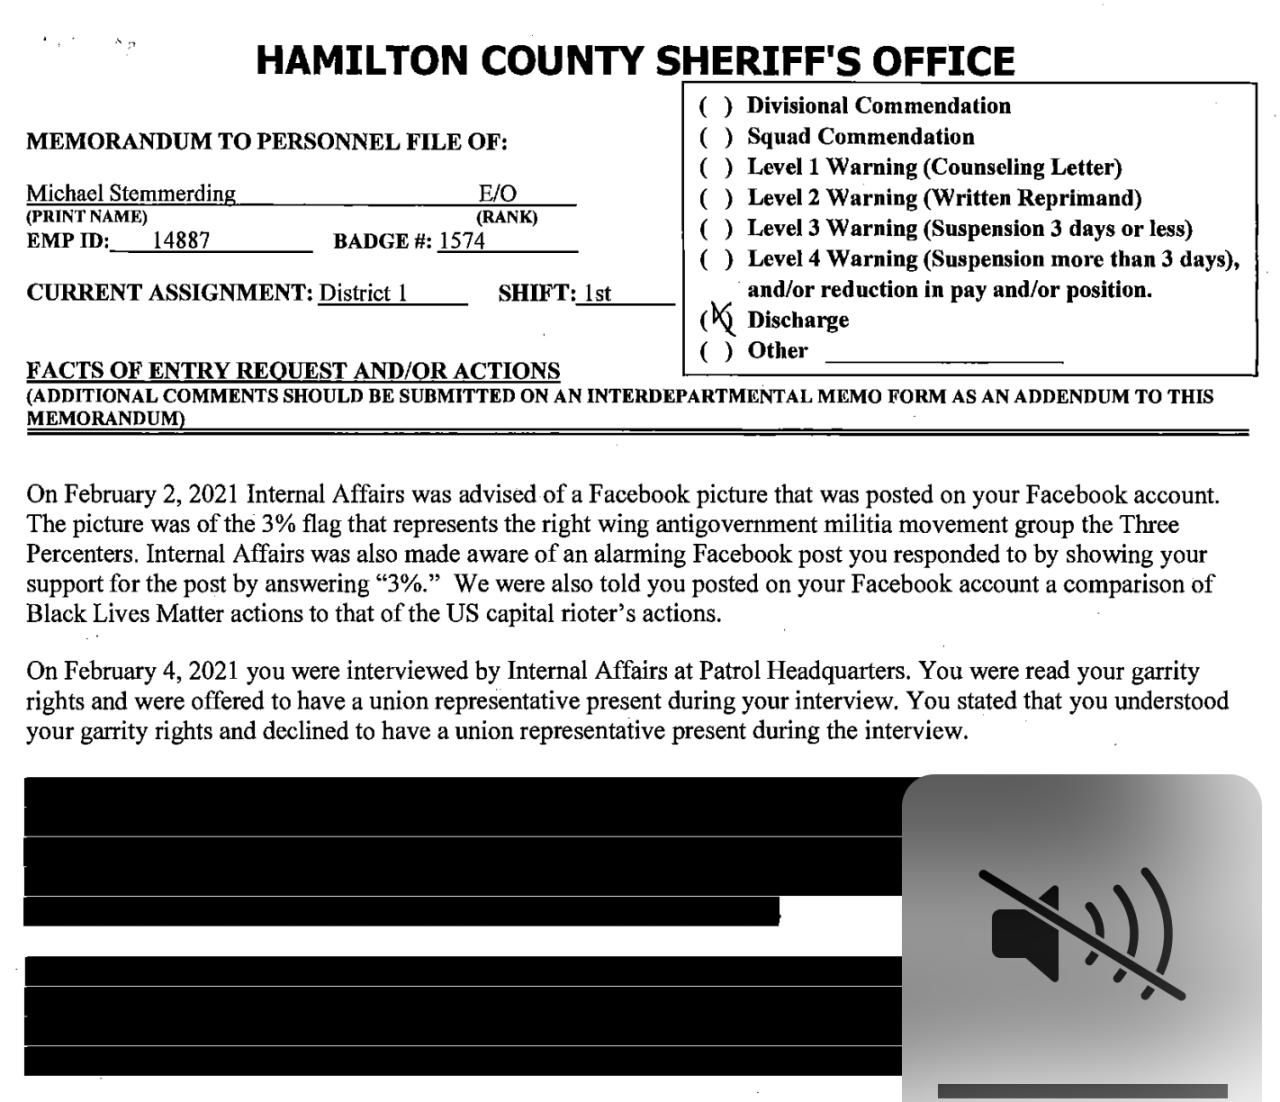 Hamilton County Sheriff's Office investigation report on Michael Stemmerding